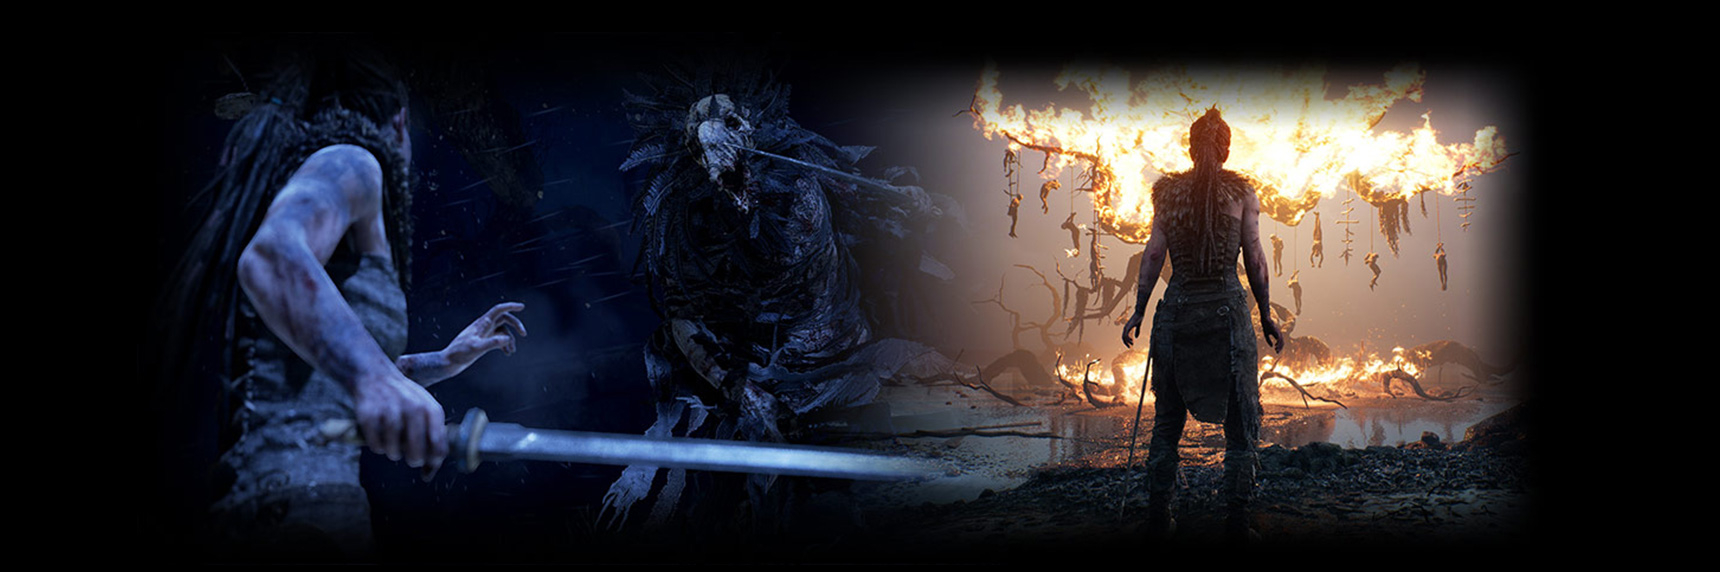 Hellblade Senua's Sacrifice Screenshot